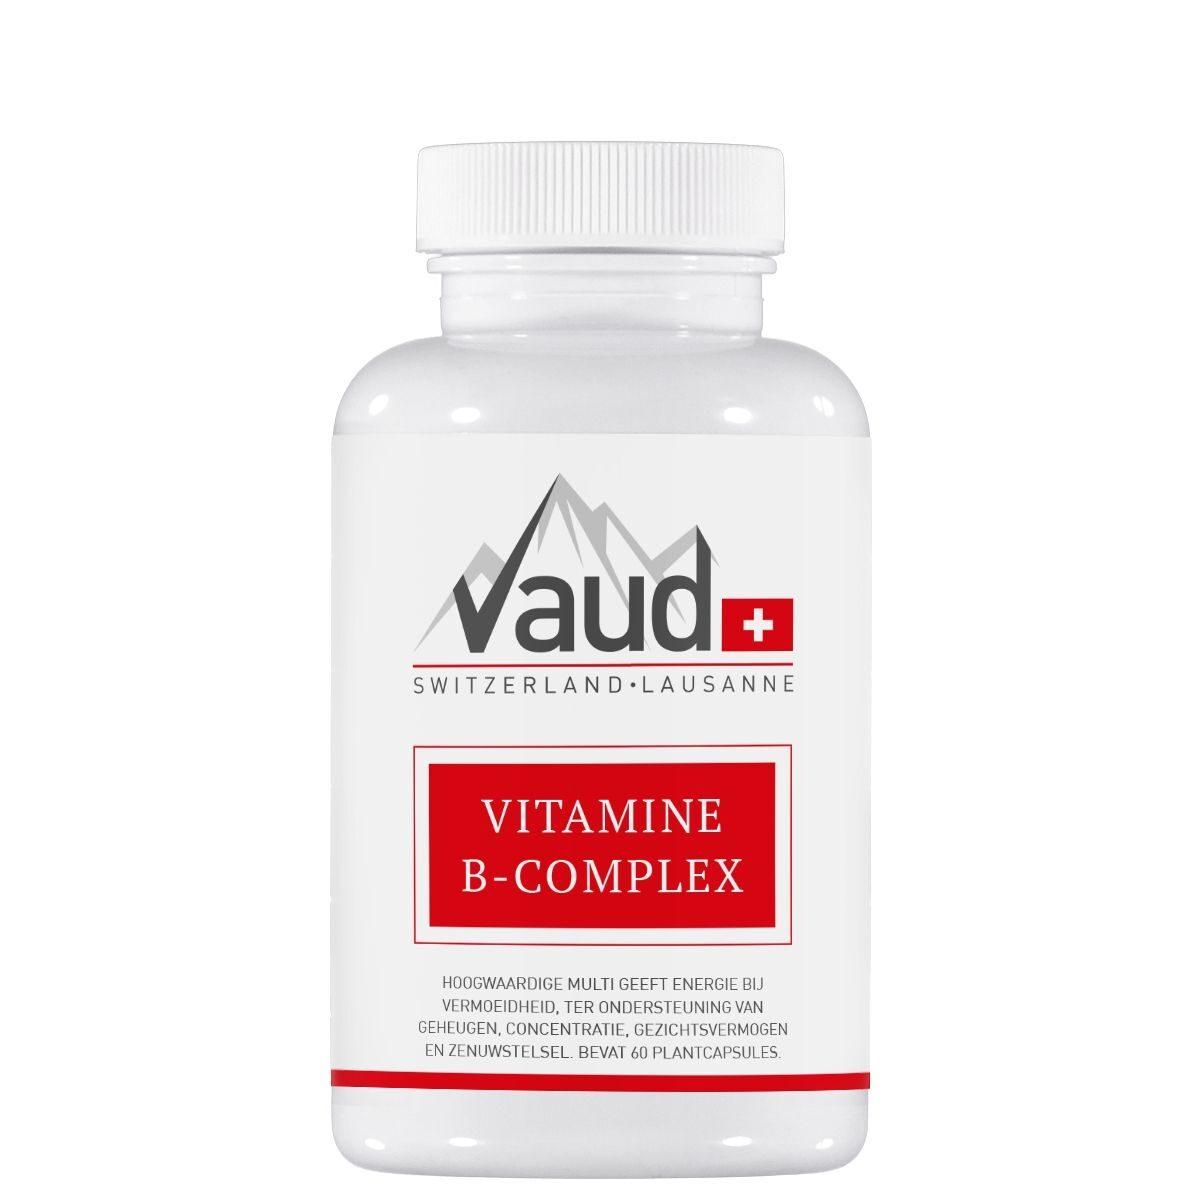 vitamine b complex vaud